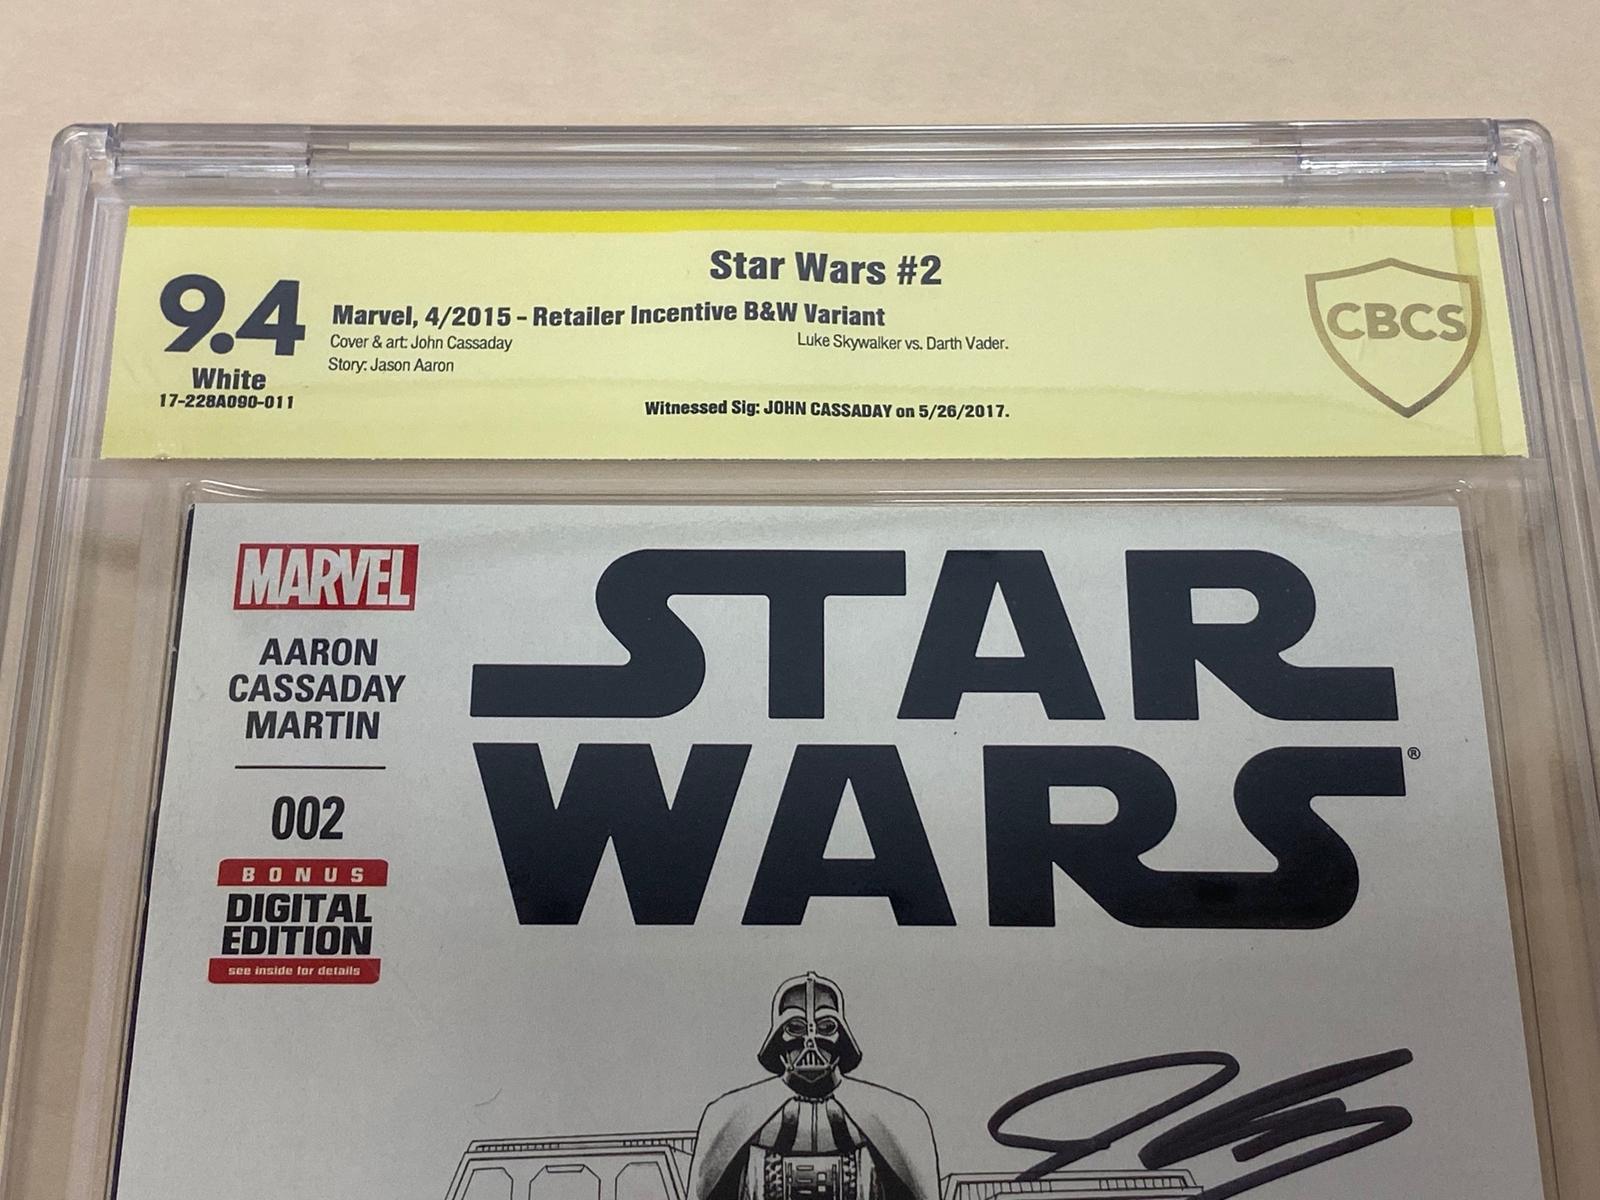 Lot 2129 - STAR WARS #2 (2015 - MARVEL) Graded CBCS 9.4 (Cents Copy) SIGNED BY JOHN CASSADAY - Retailer